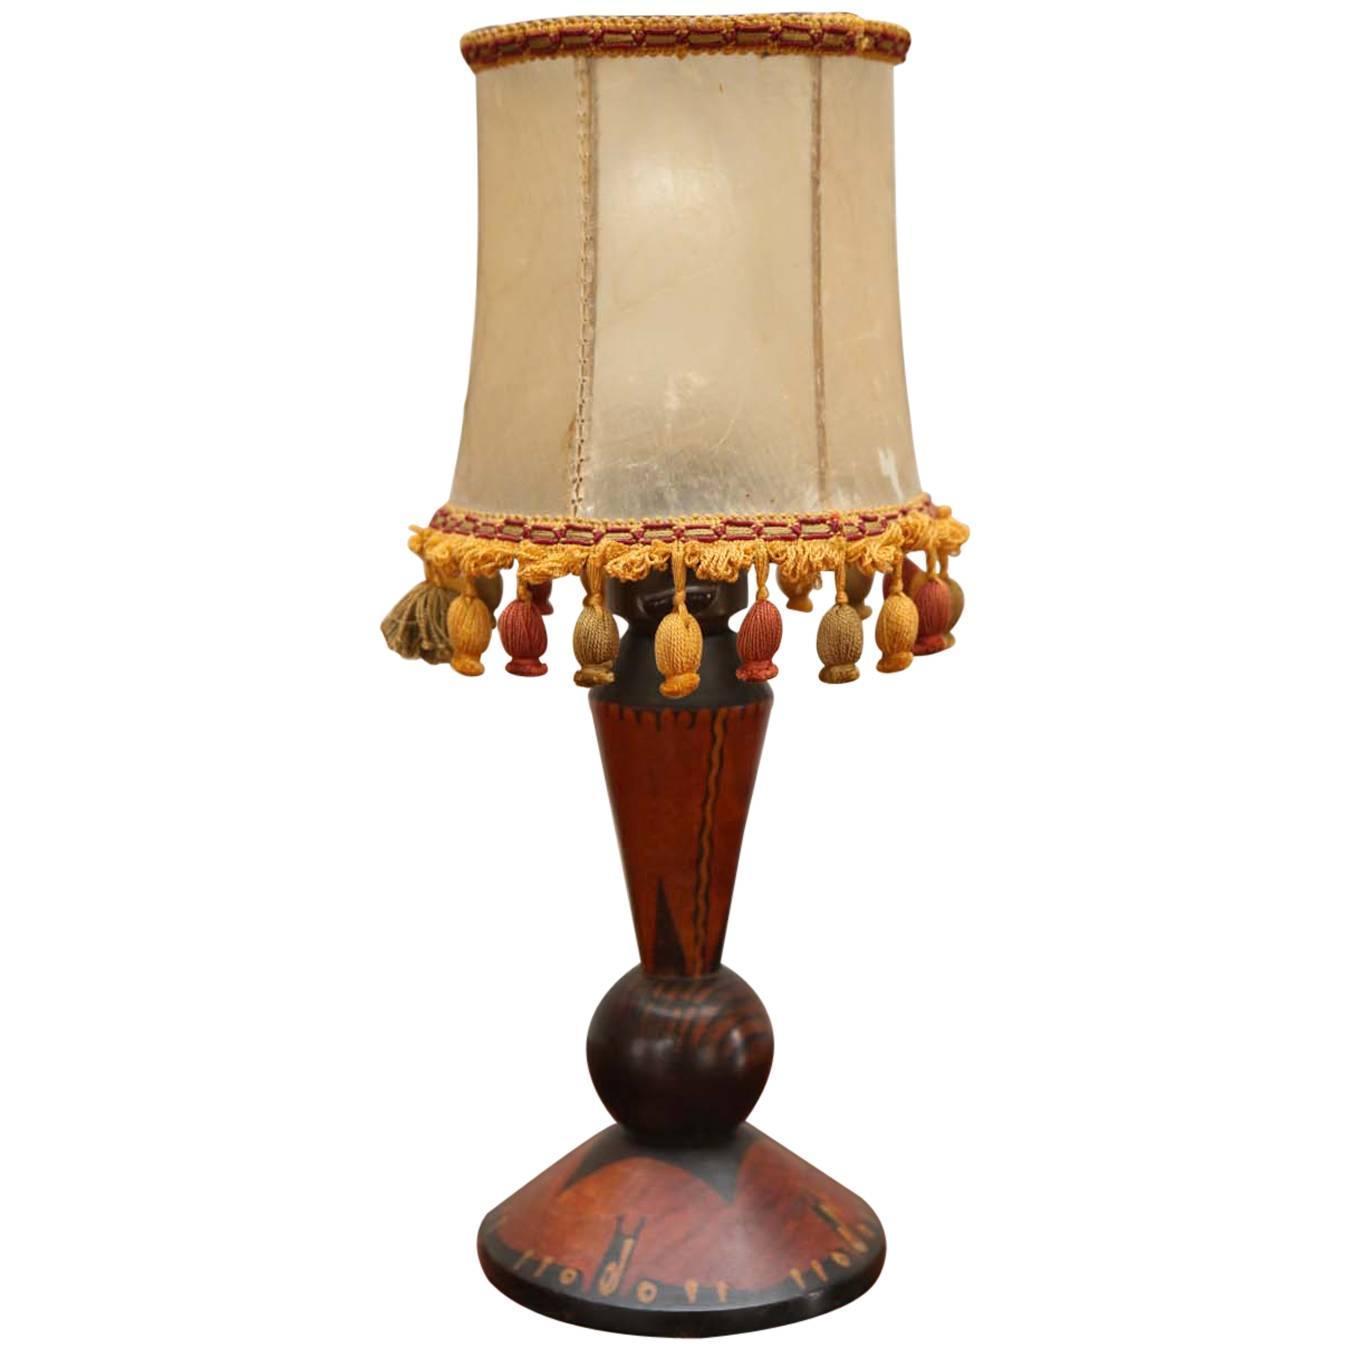 arts and crafts table lamp at 1stdibs. Black Bedroom Furniture Sets. Home Design Ideas